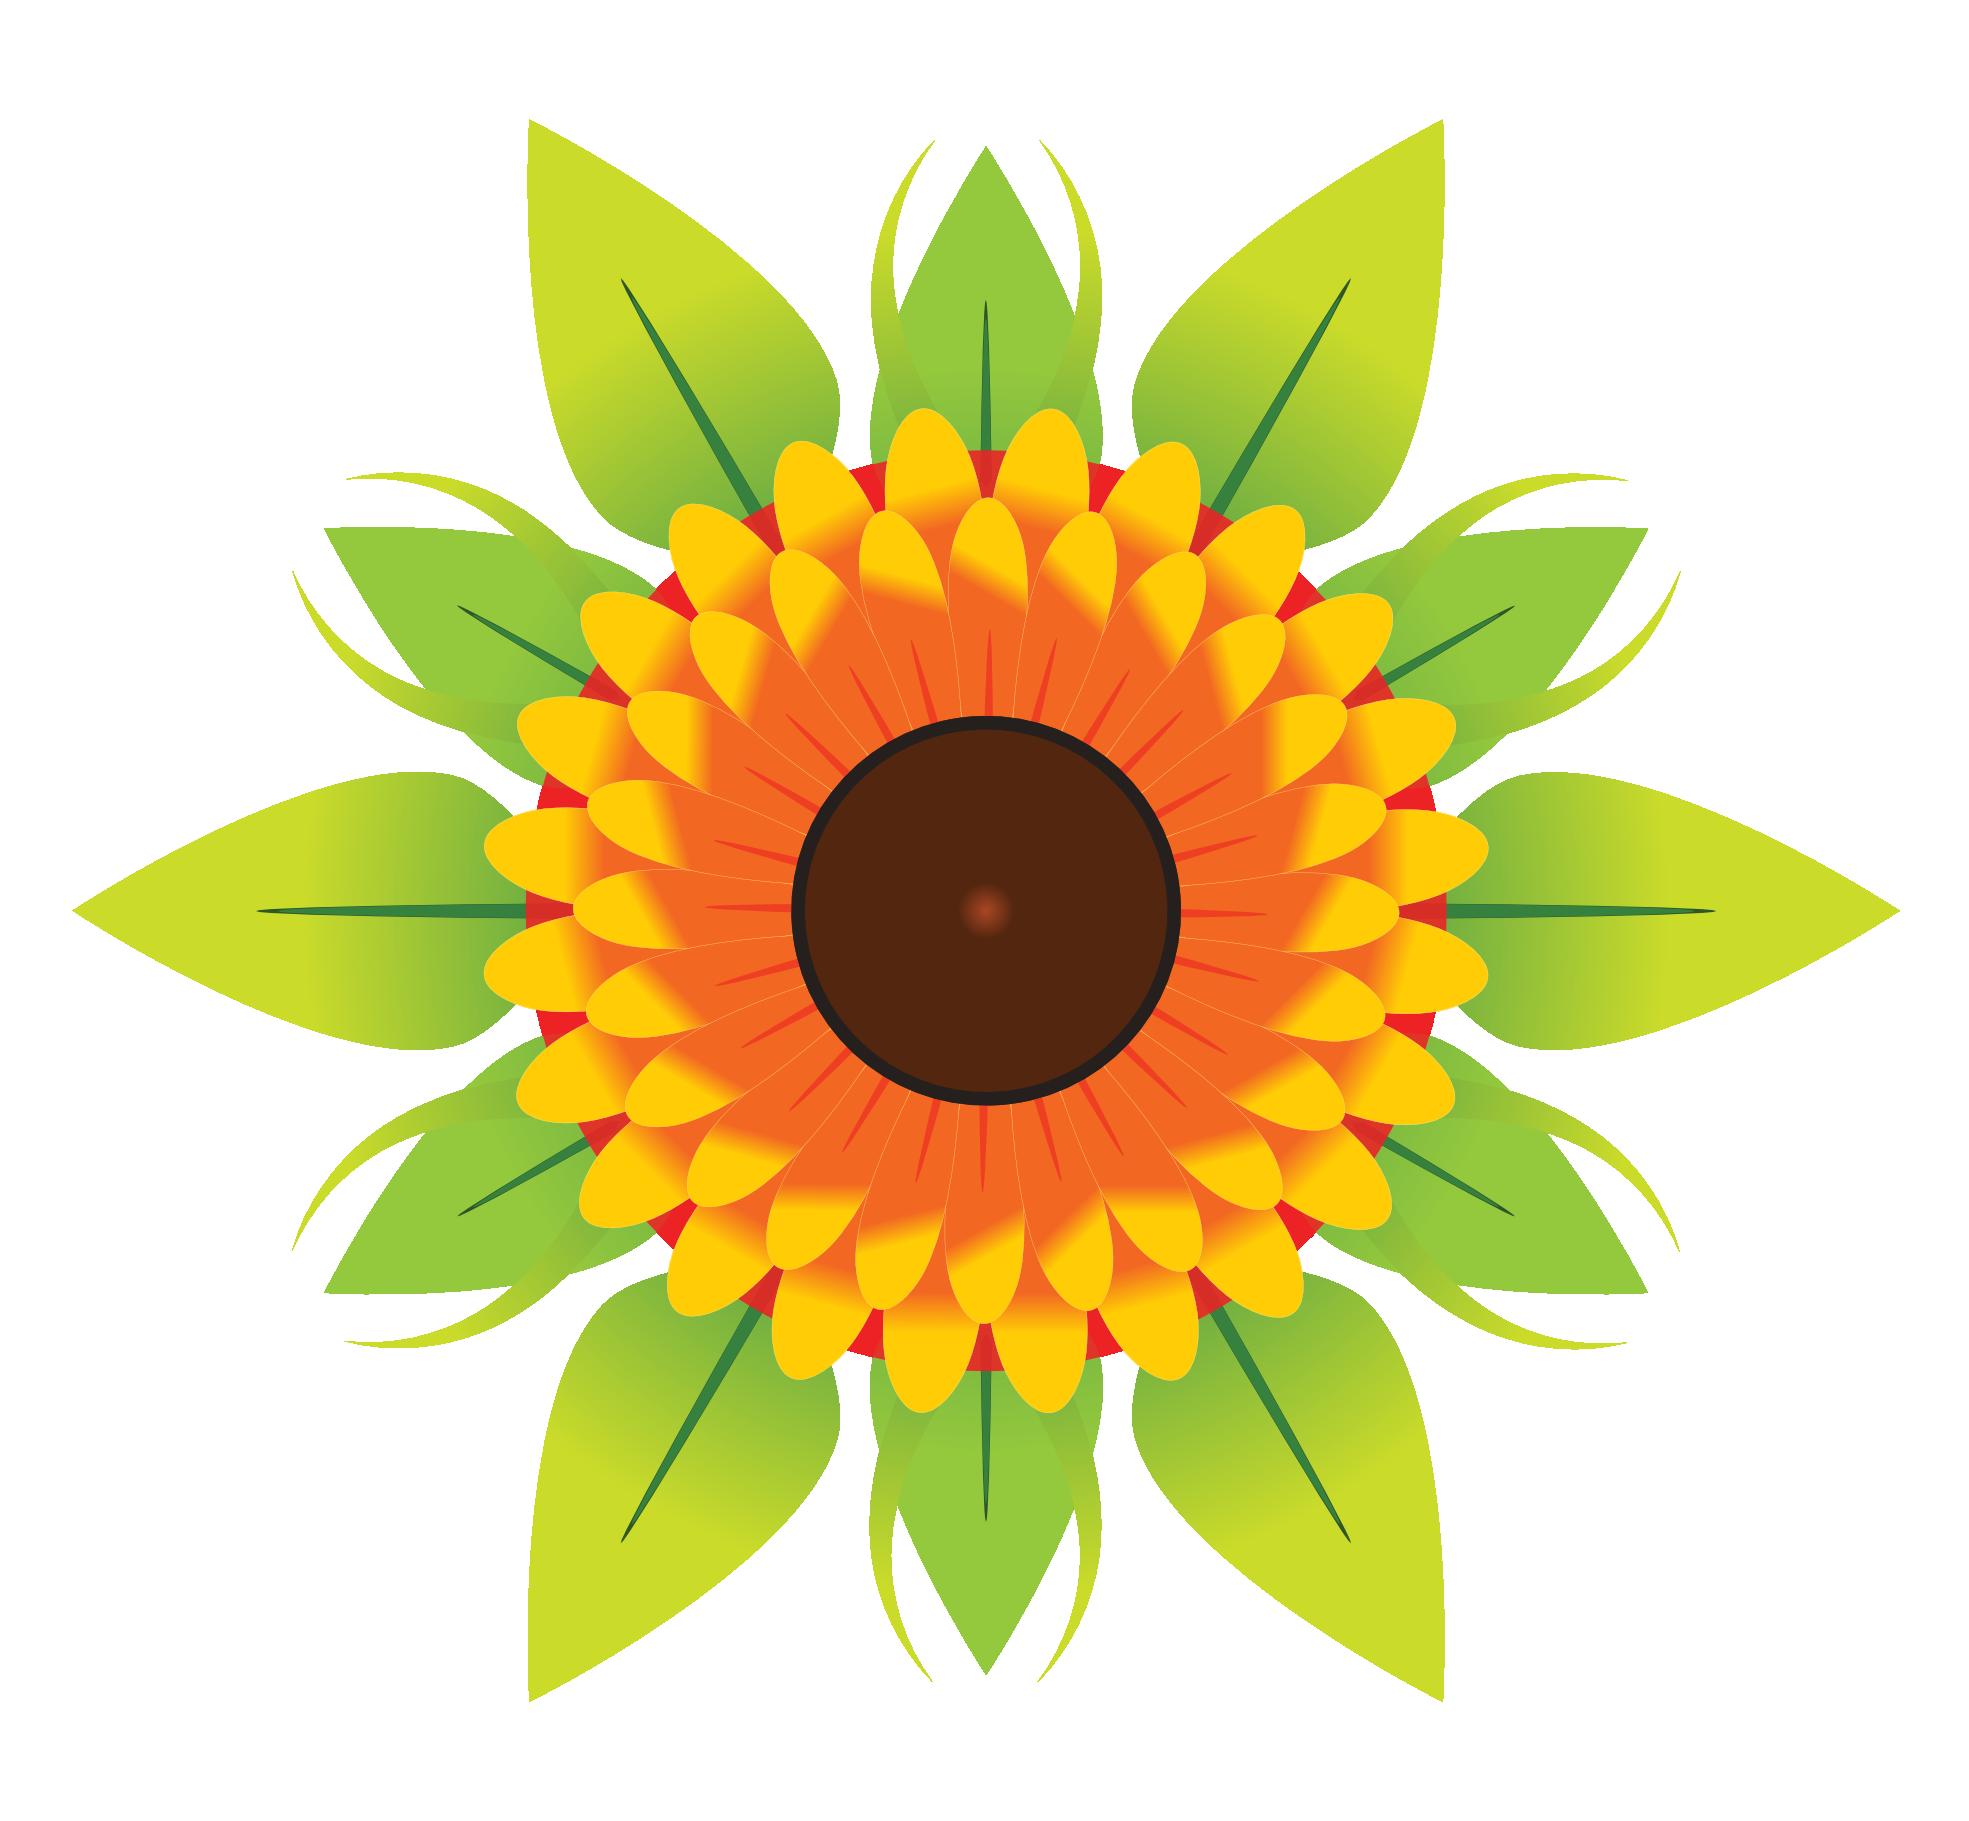 Flower Vector PNG Image - PurePNG | Free transparent CC0 ...